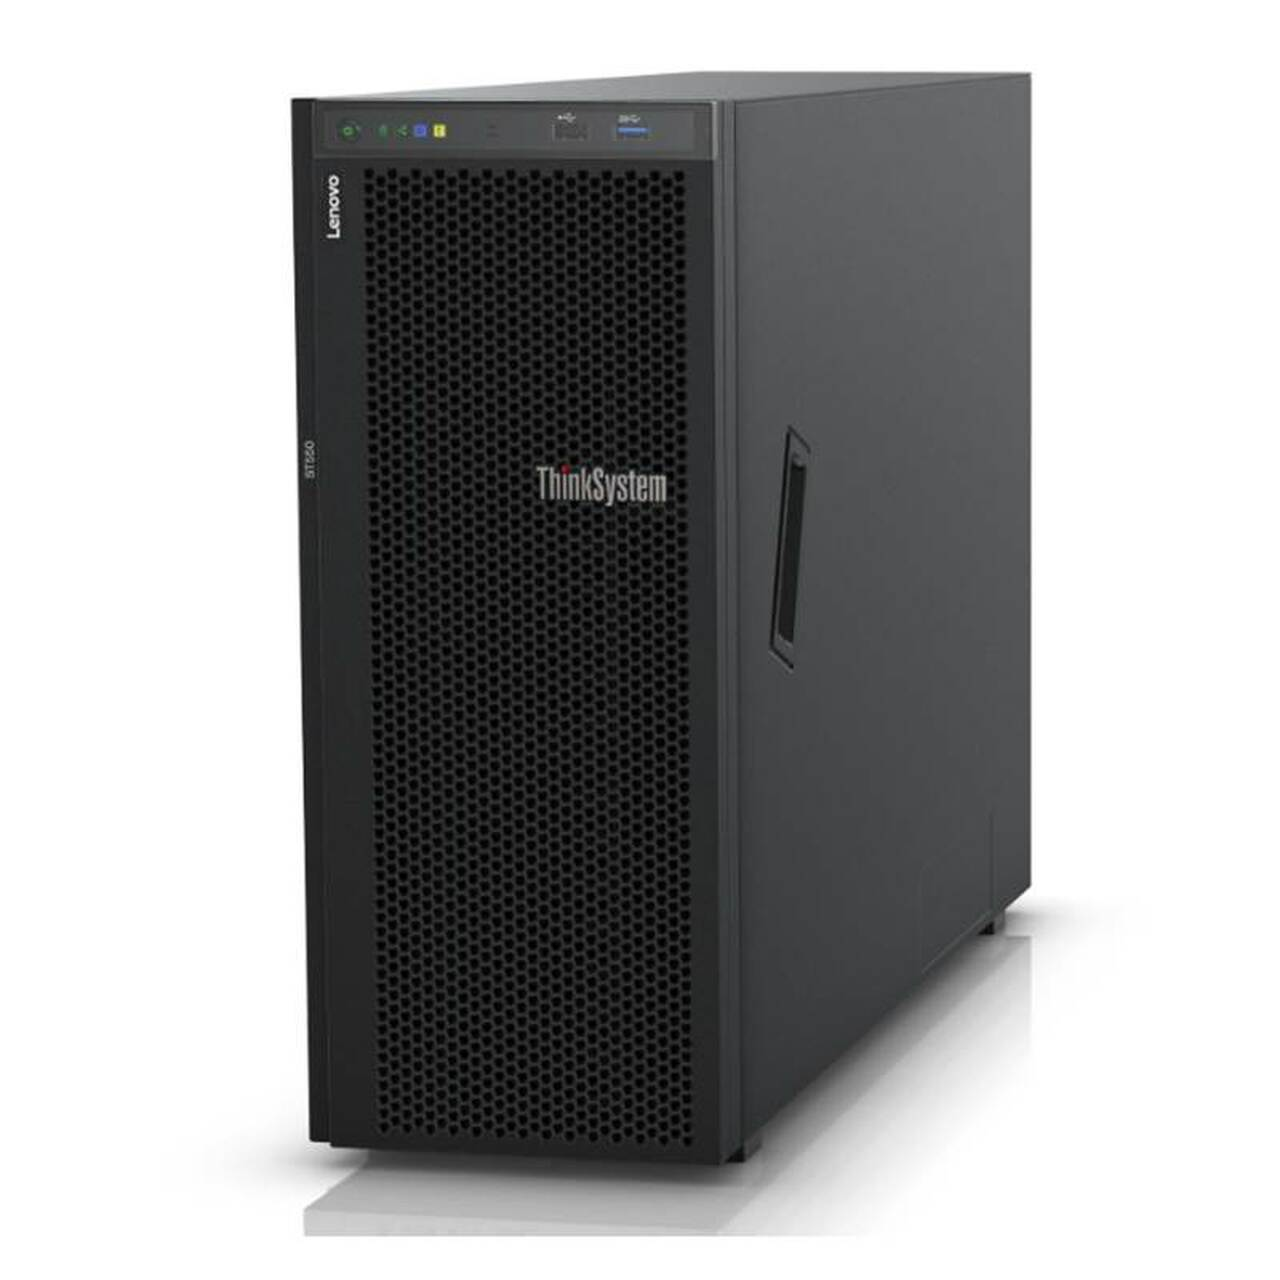 LENOVO, ThinkSystem, ST550, 4U, Tower, Server, 1, x, Intel, Xeon, Bronze, 3206, 1x16GB, 2Rx8, 4, x, 3.5, HS, Bay, HW, RAID, 530-8i, PCIe,